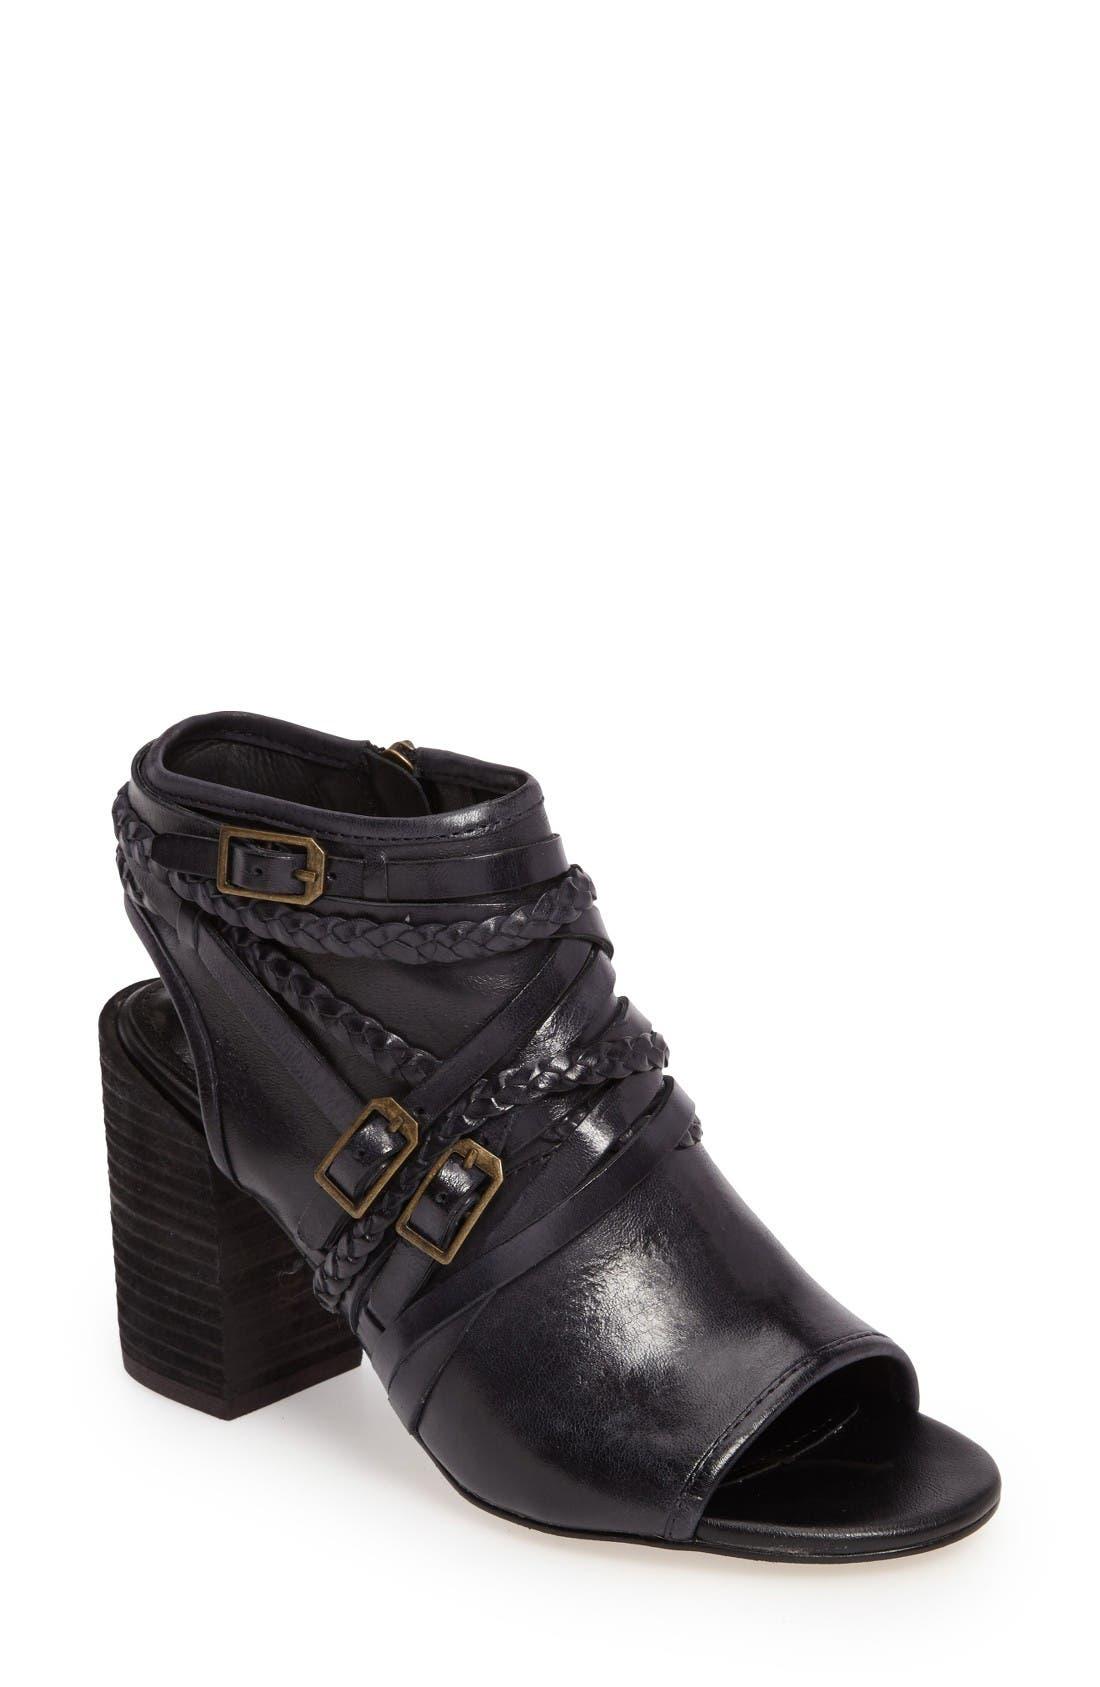 ISOLÁ Leonora Strappy Block Heel Sandal